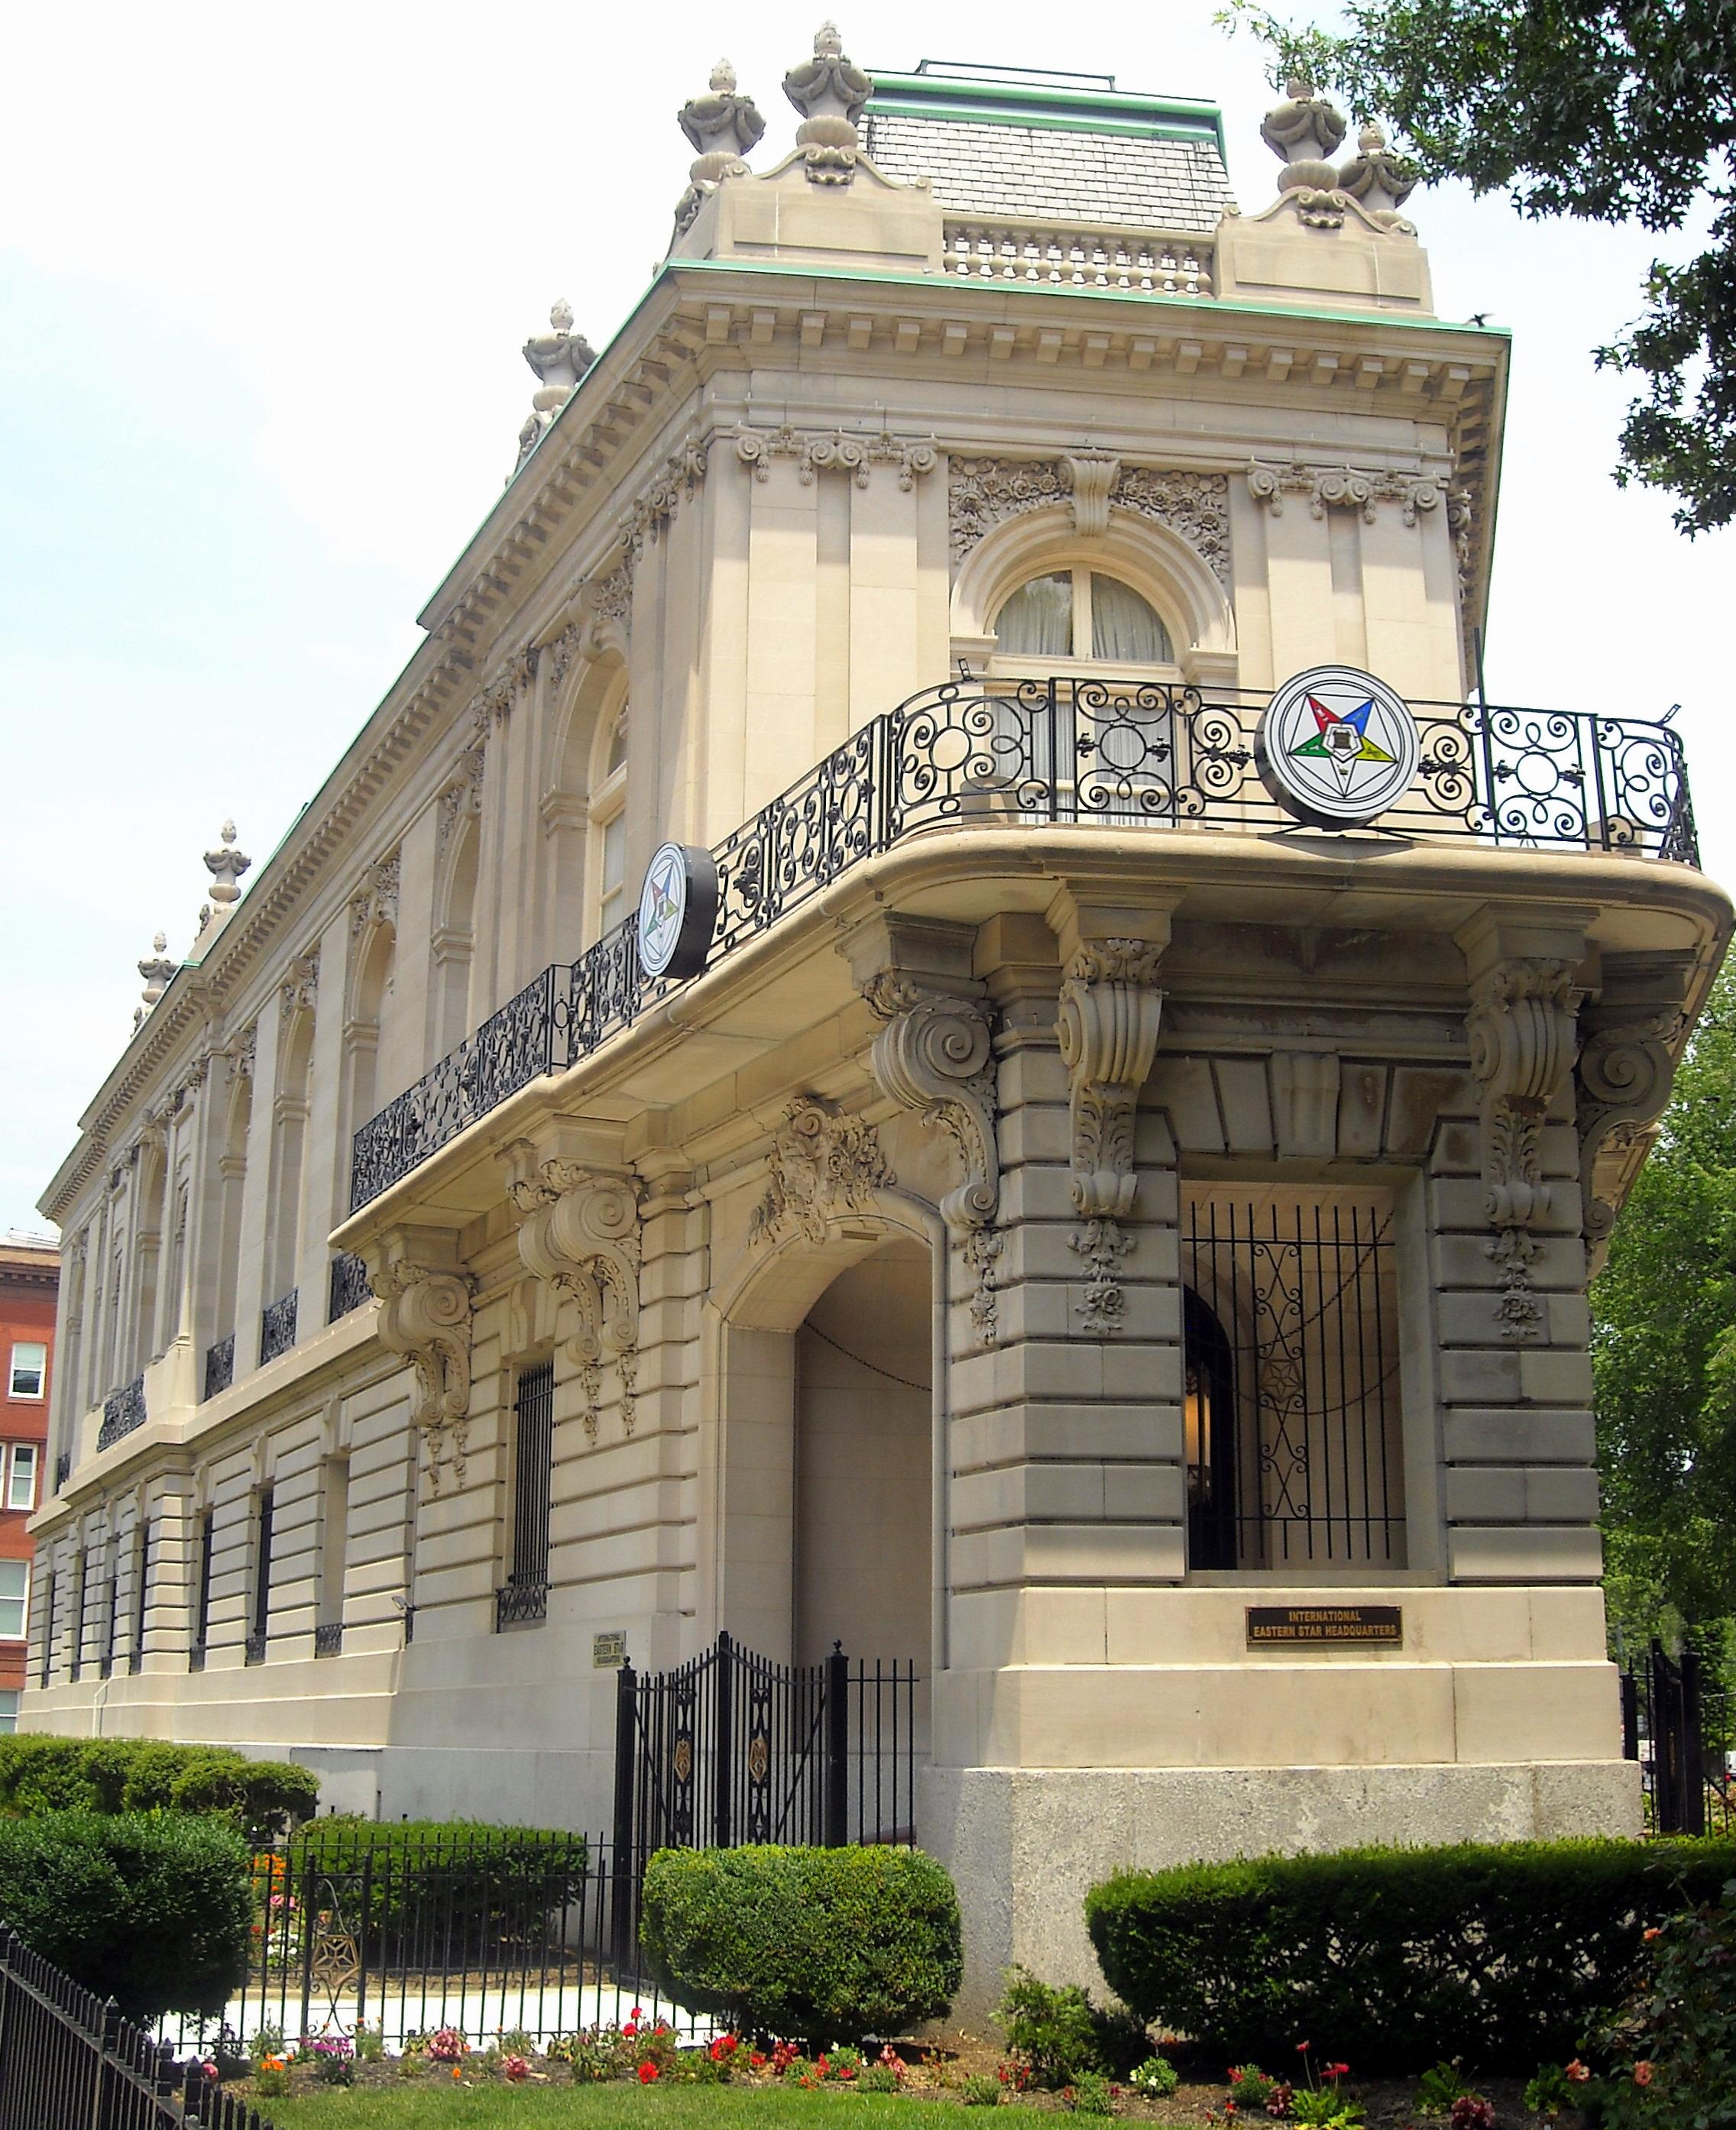 Building, Architecture, Landmark, Classical architecture